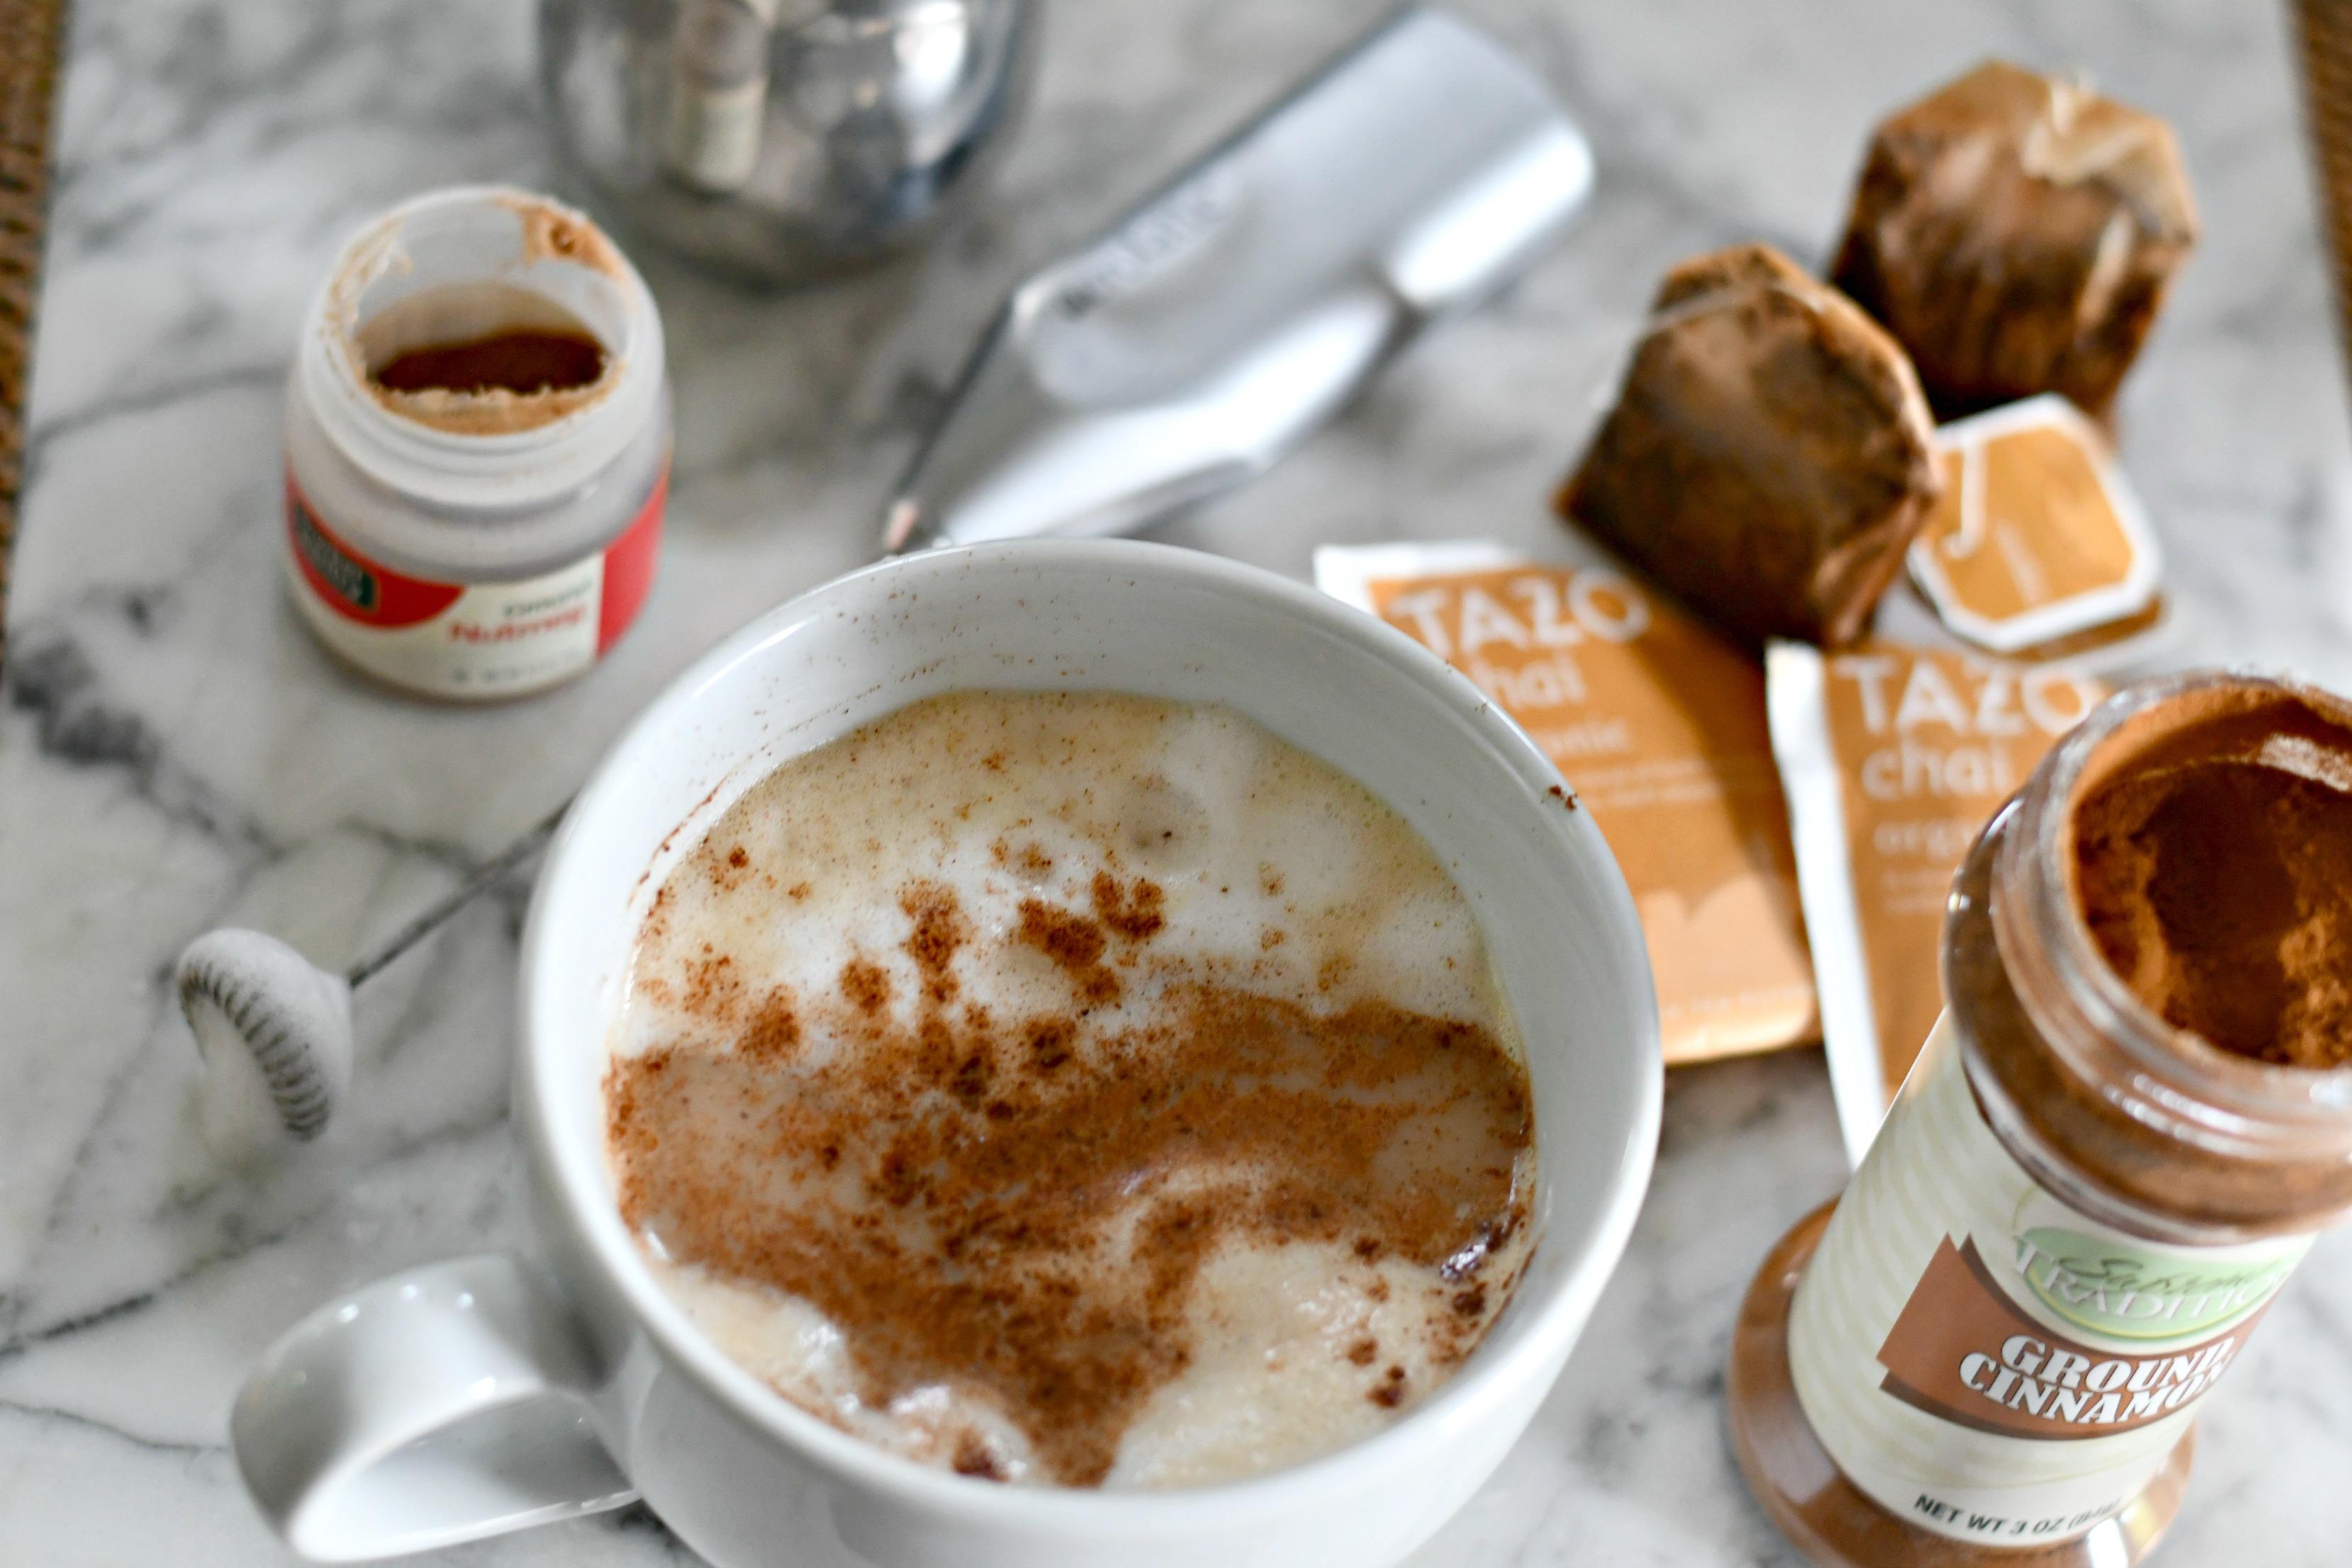 diy starbucks chai latte with cinnamon sprinkled on top